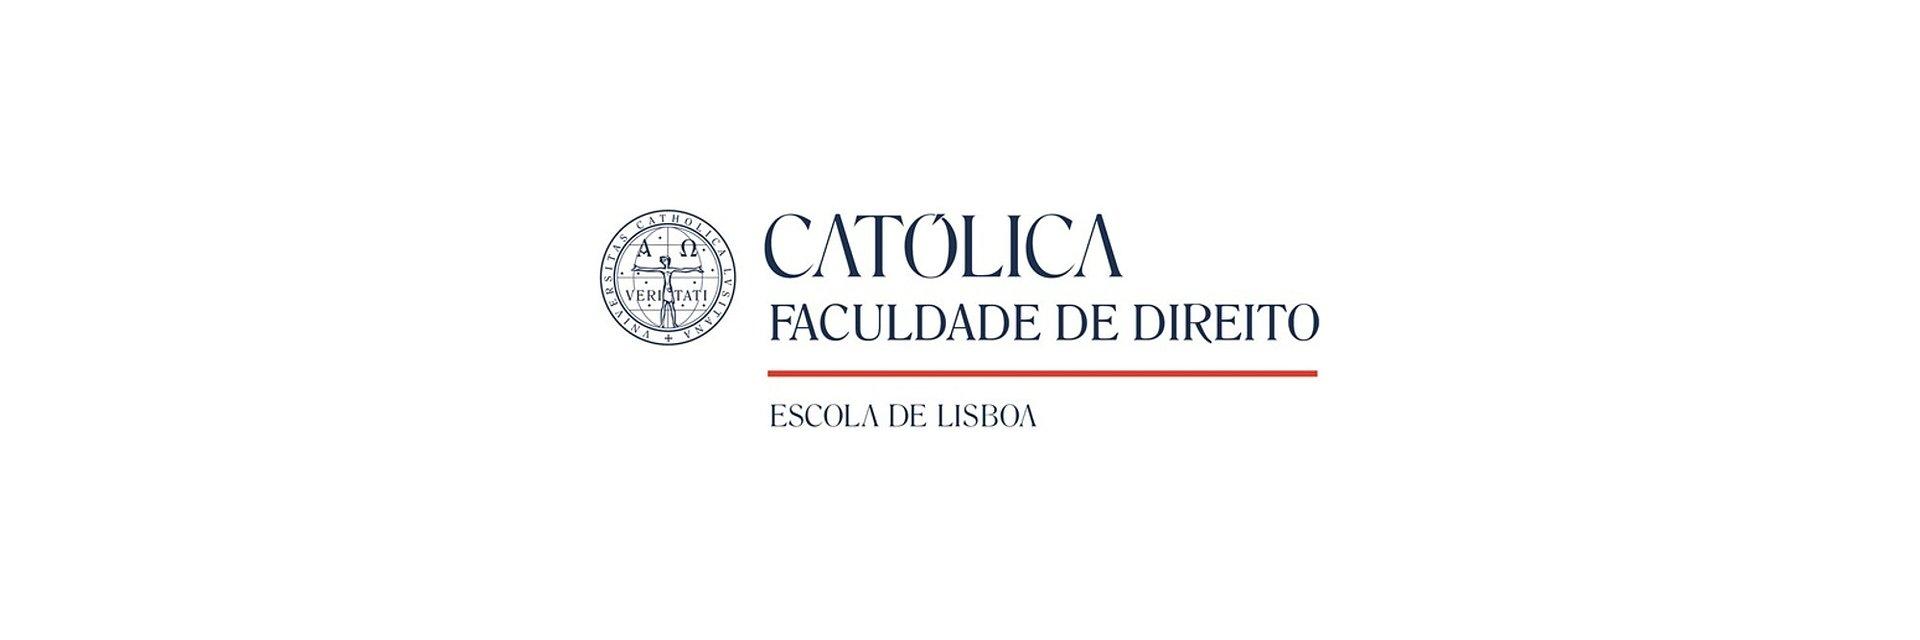 Católica organiza curso gratuito sobre os impactos jurídicos da Covid-19